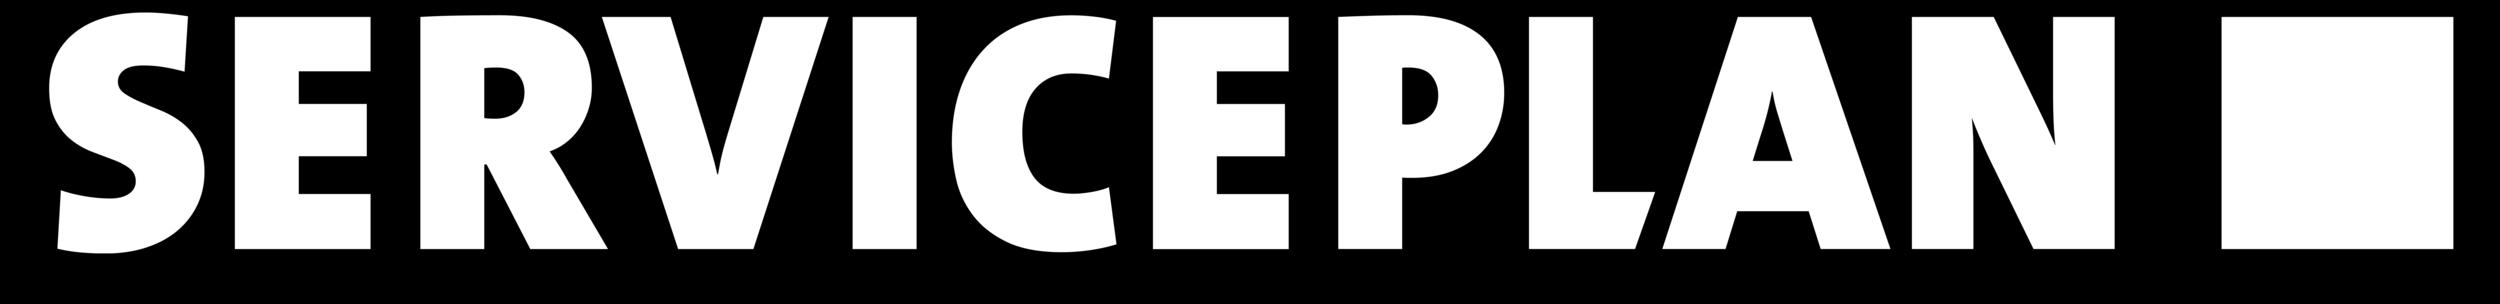 AGENCY - serviceplan.png